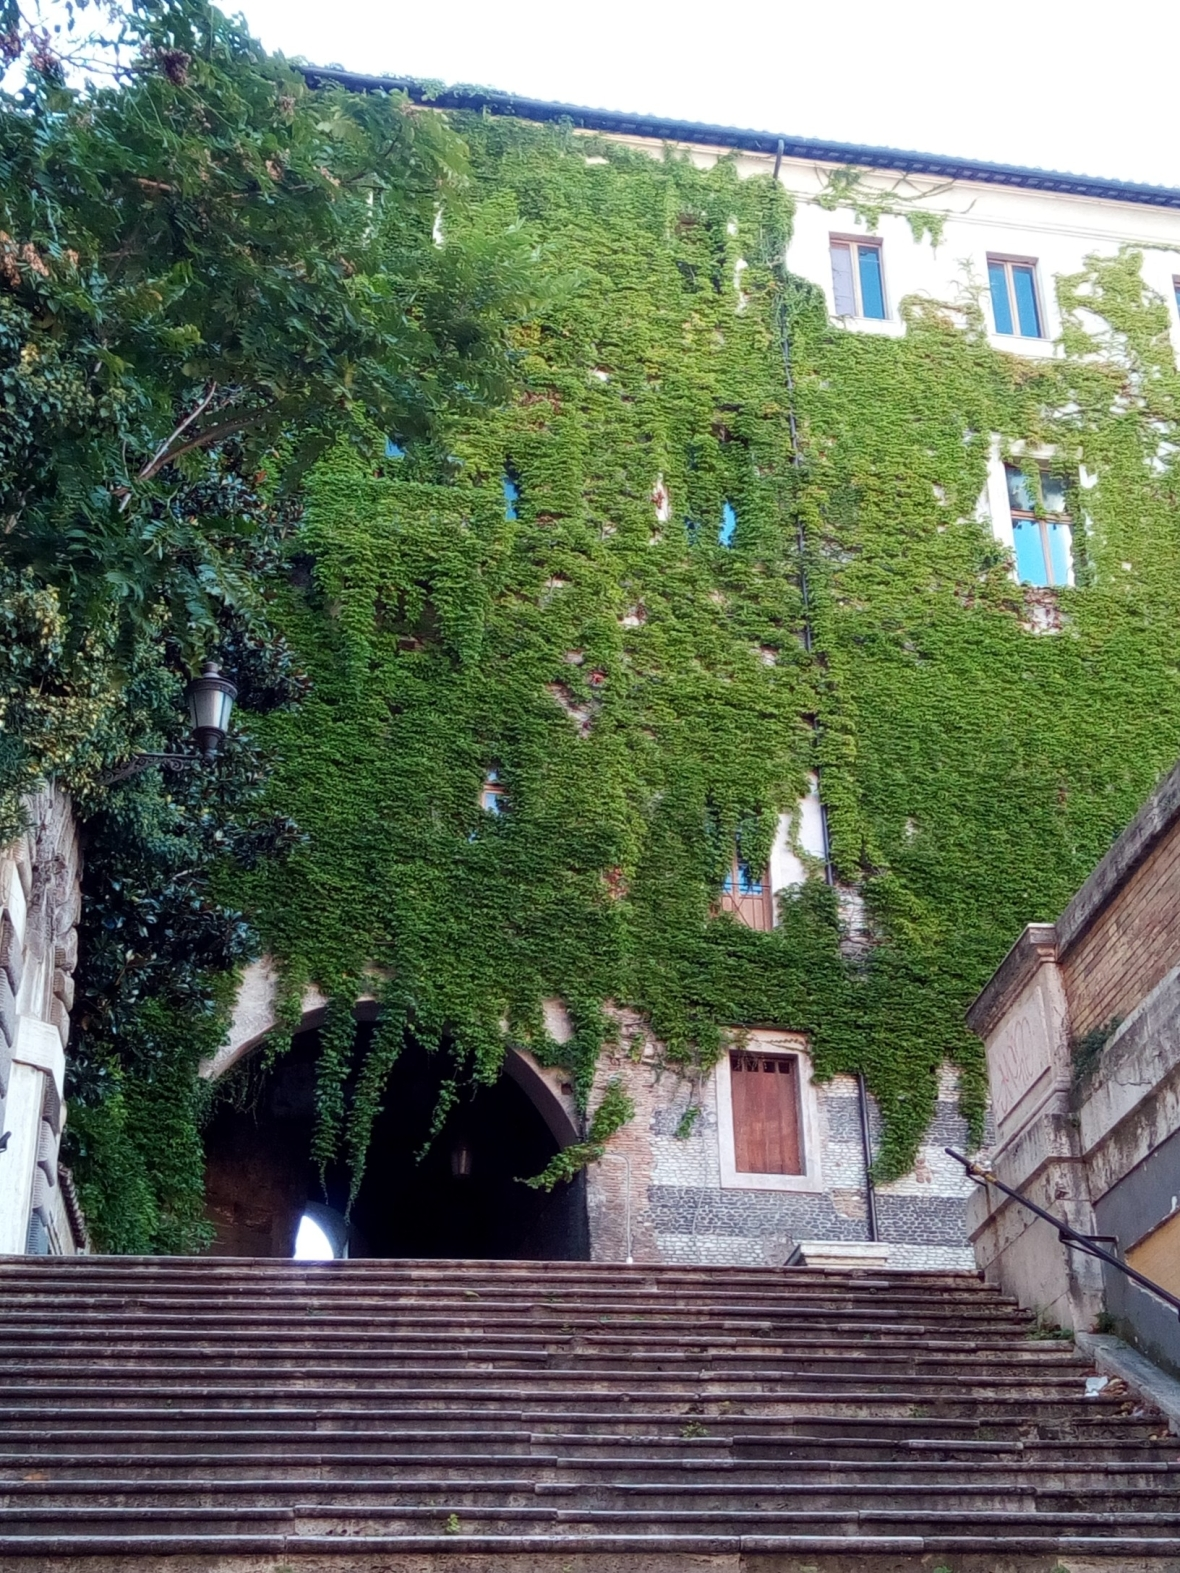 Rione Monti - Via San Francesco di Paola